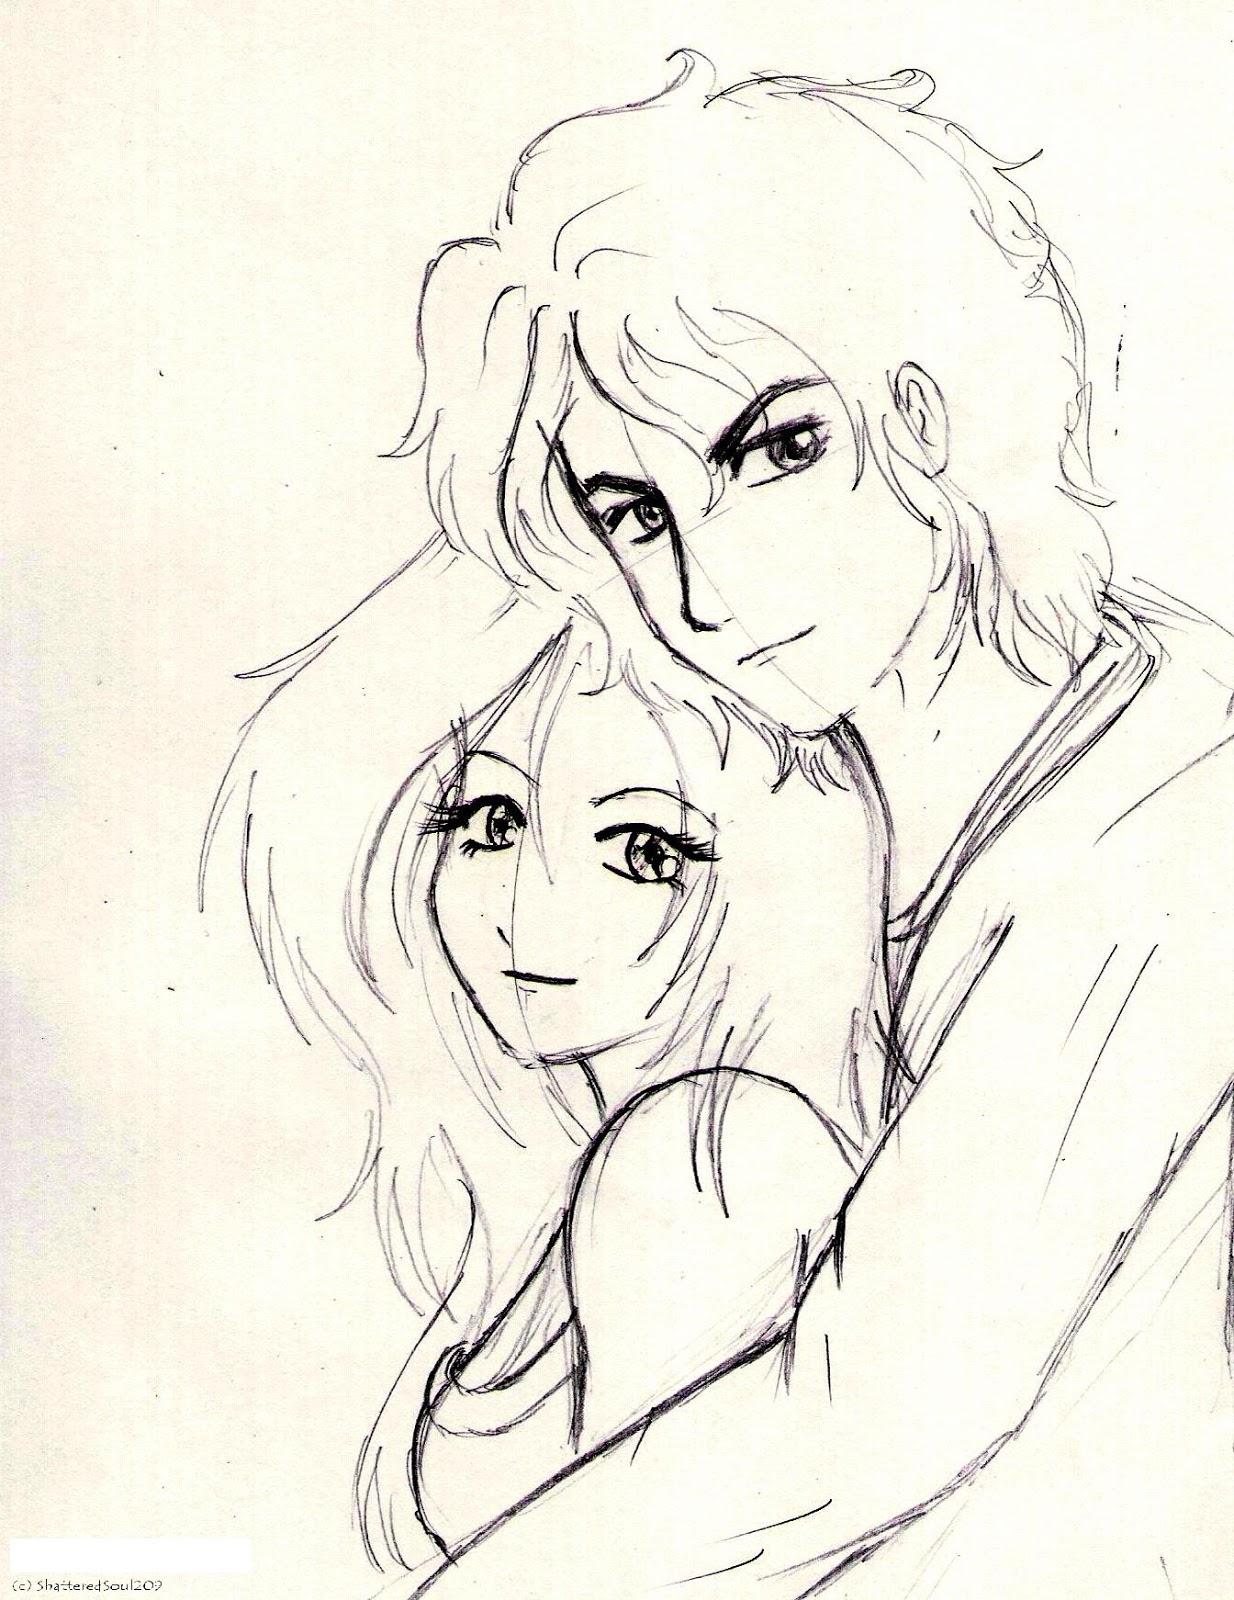 1234x1600 Cute Cartoon Couples Holding Hands